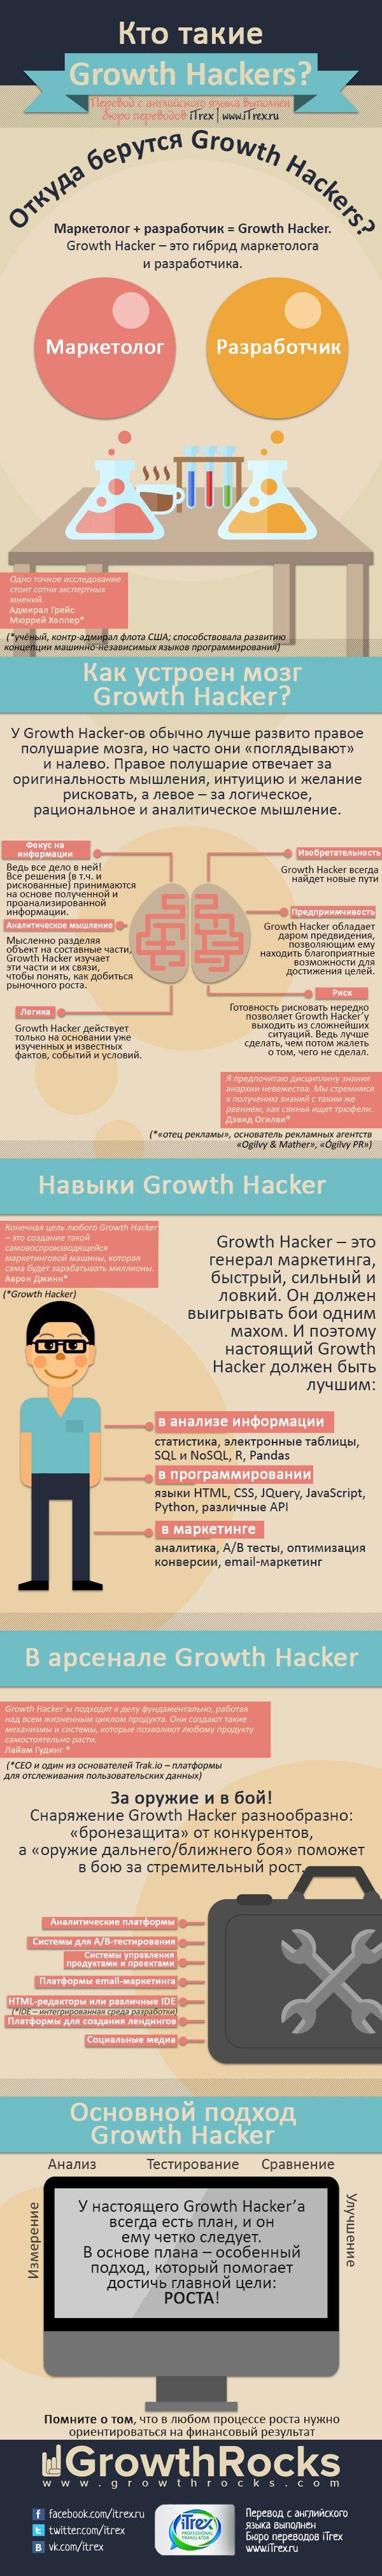 Перевод сделан в Бюро переводов iTrex, Москва: Growth Hackers